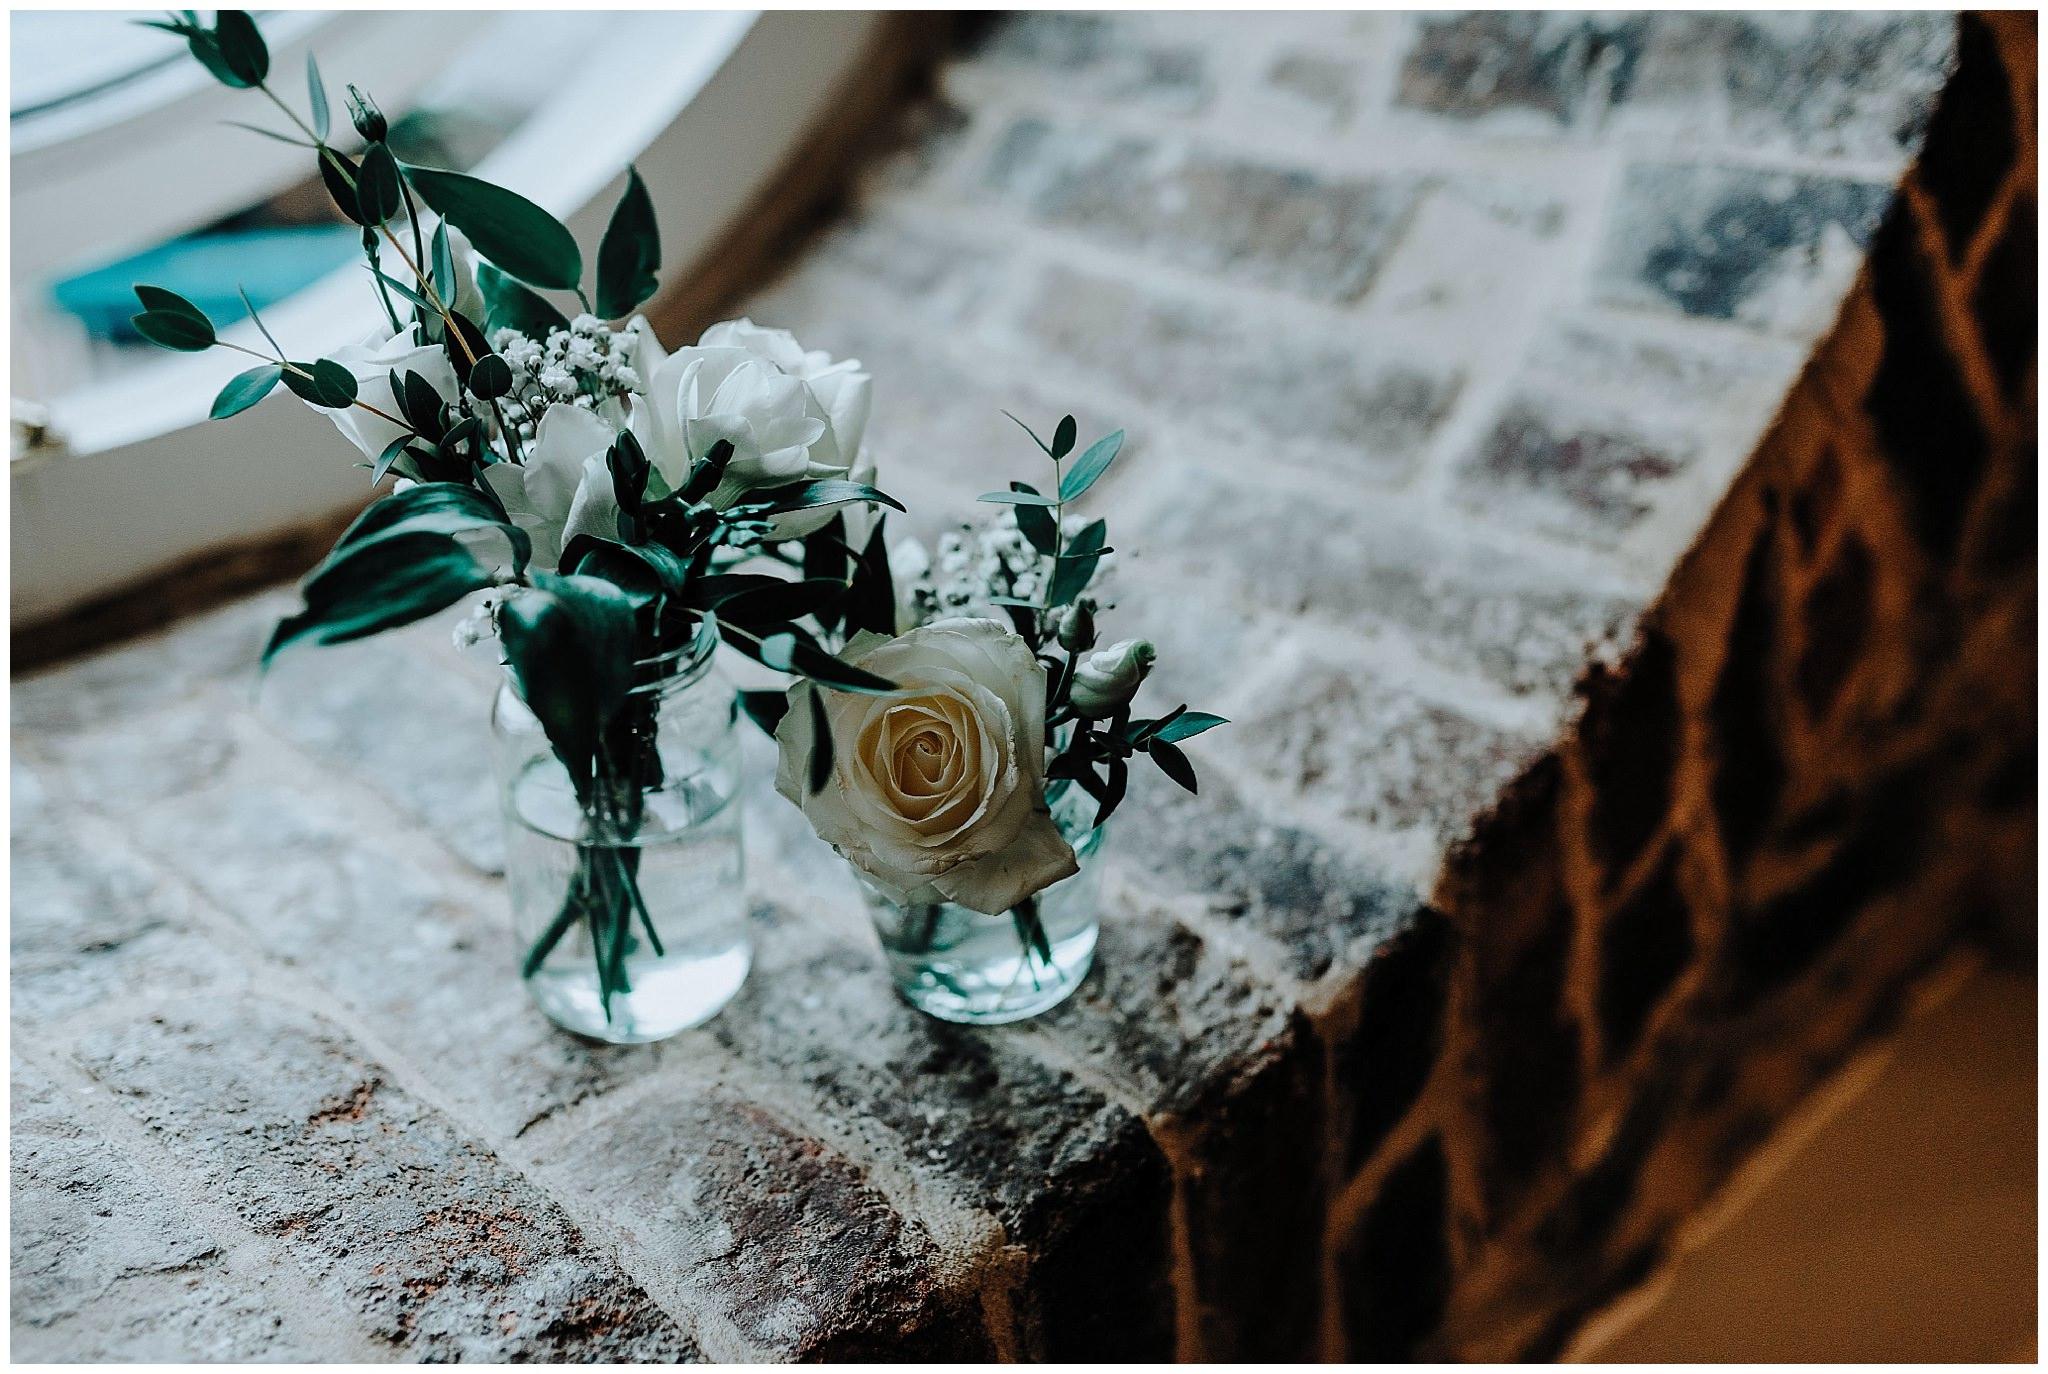 White roses in vases at Bodnant Welsh Food Centre